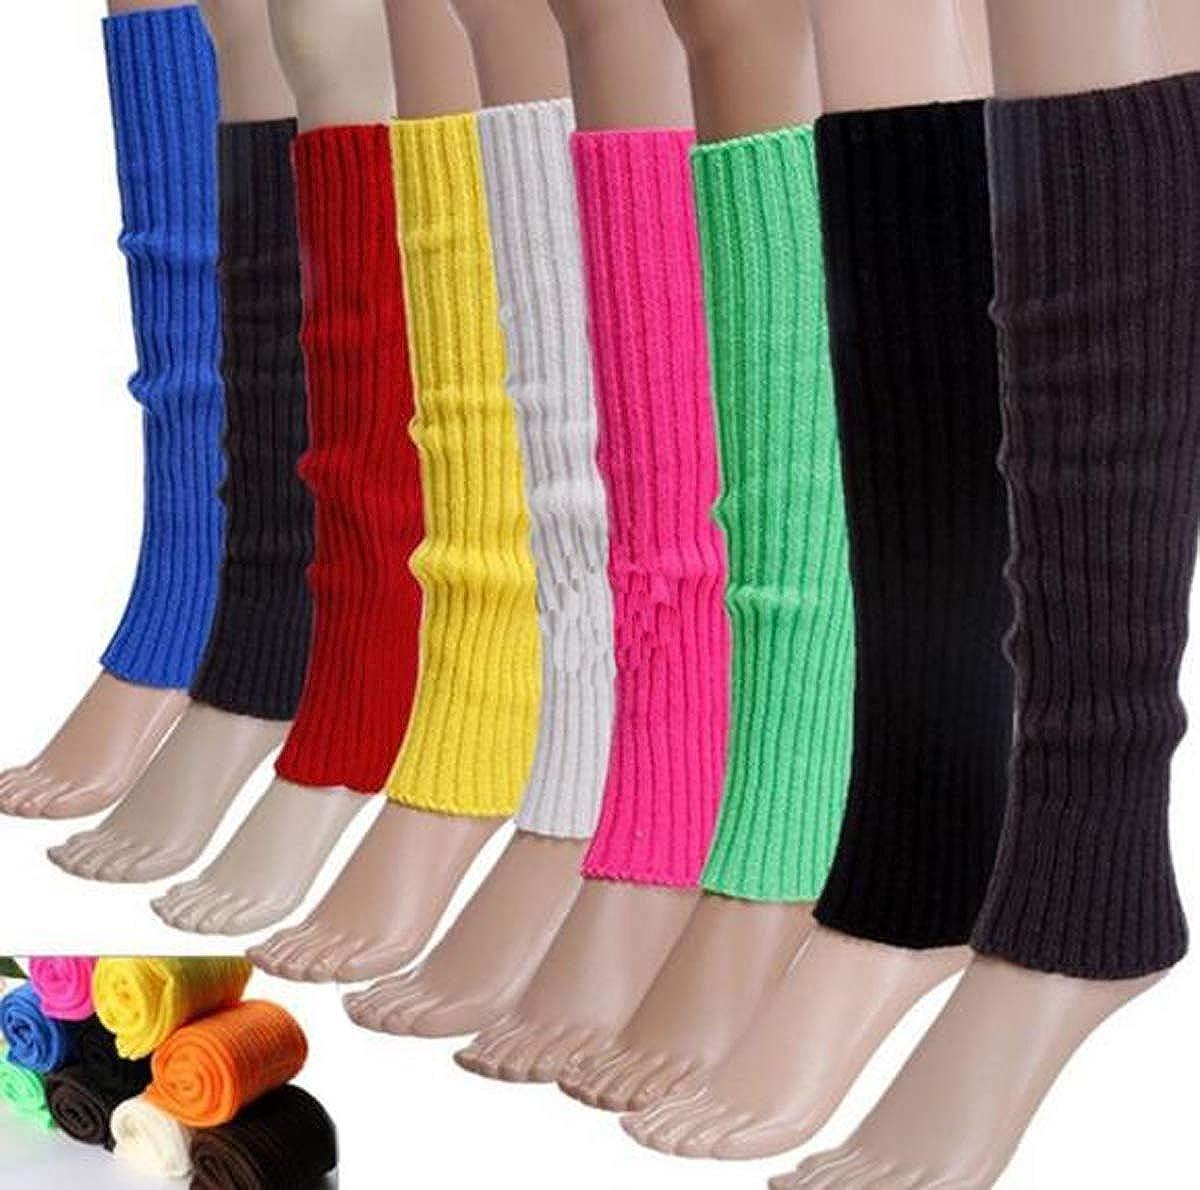 FZBNSRKO Women Girls 80s Knit Leg Warmers Ribbed Long Leg Warmers for Party Sports Accessories